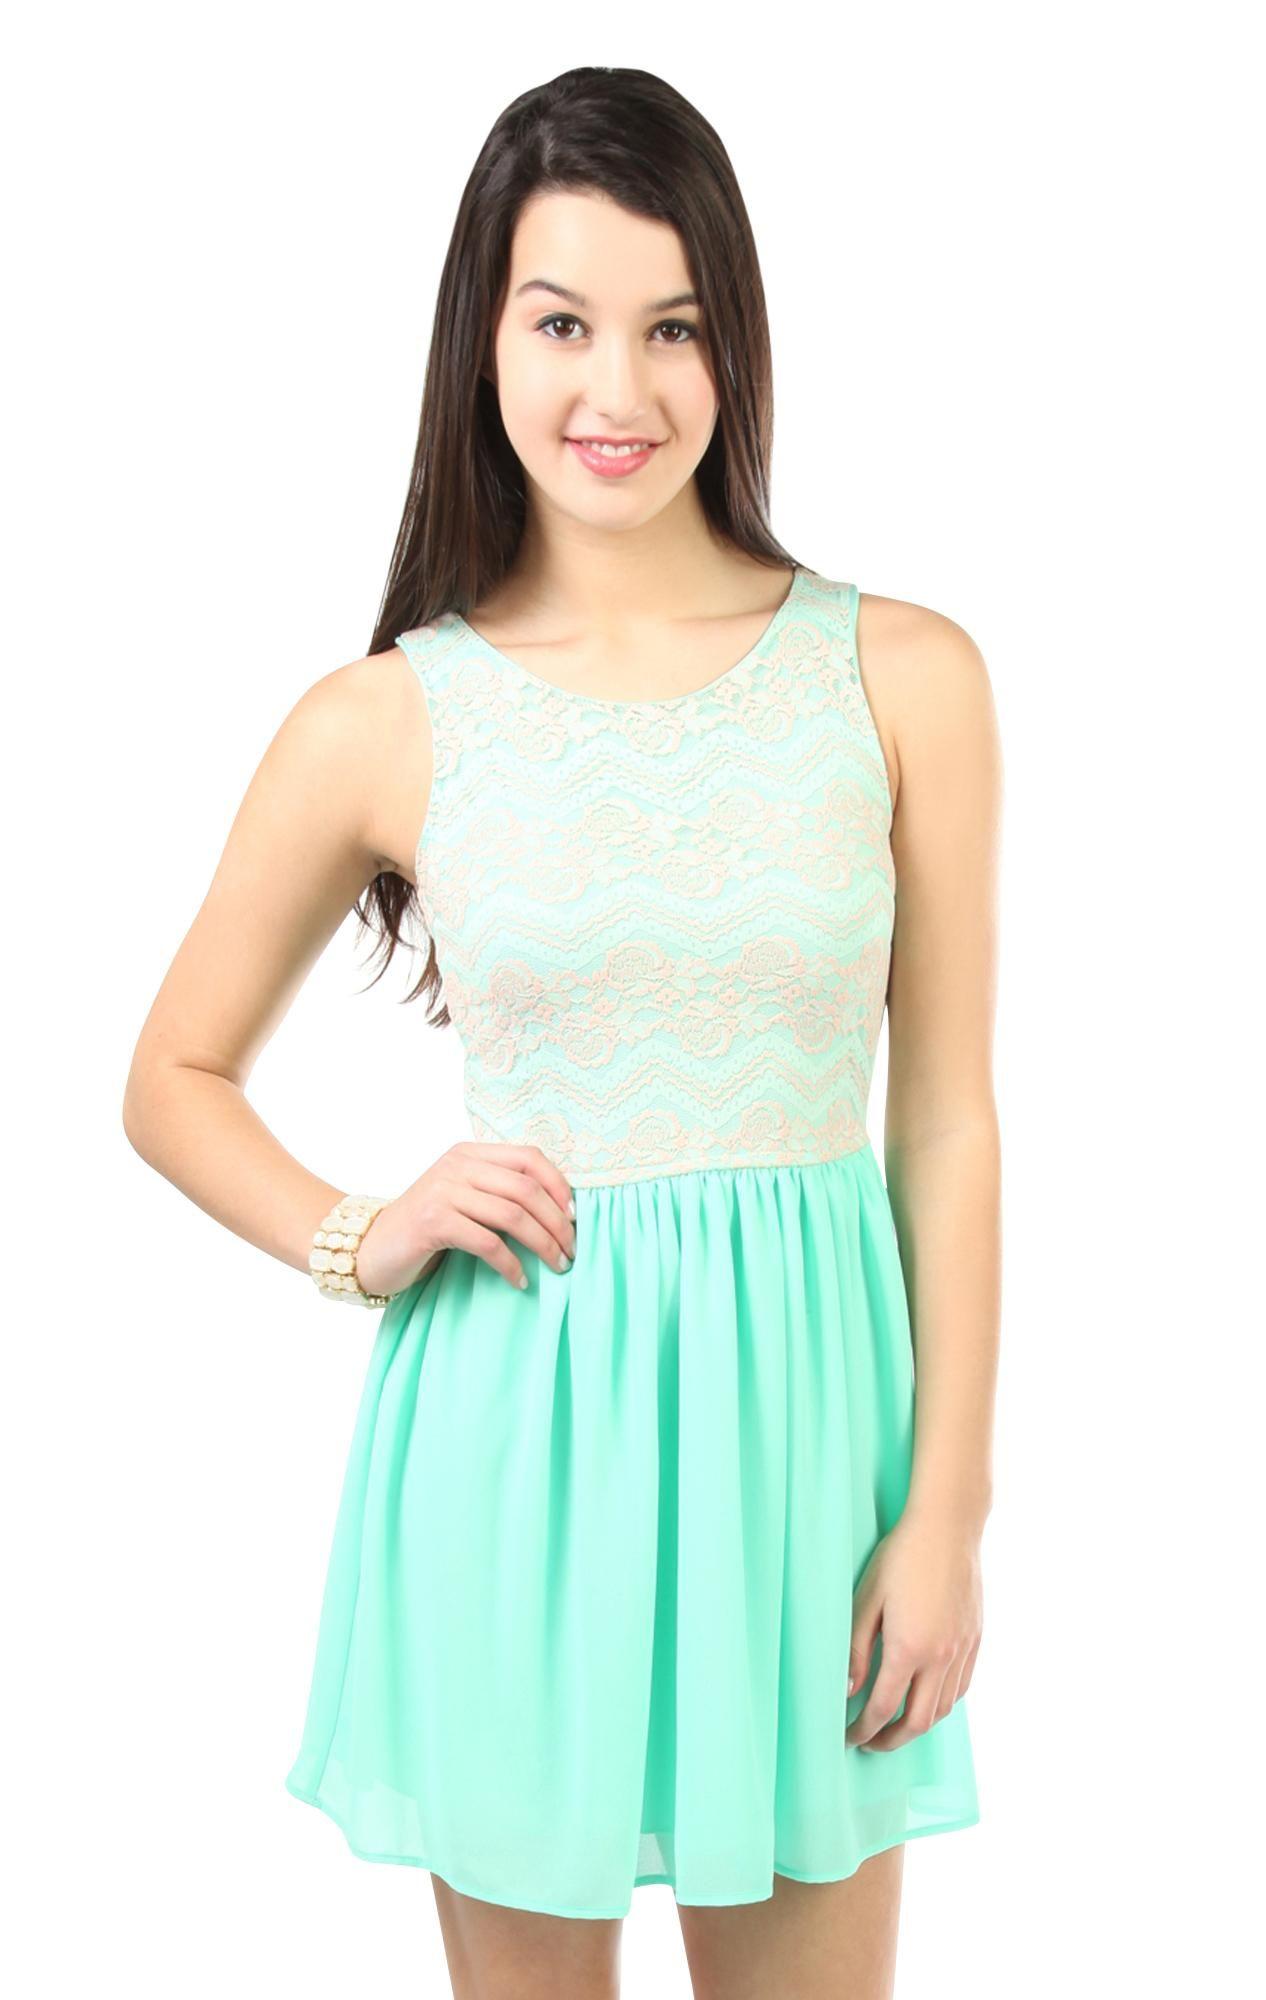 Long Casual Dresses at Debs